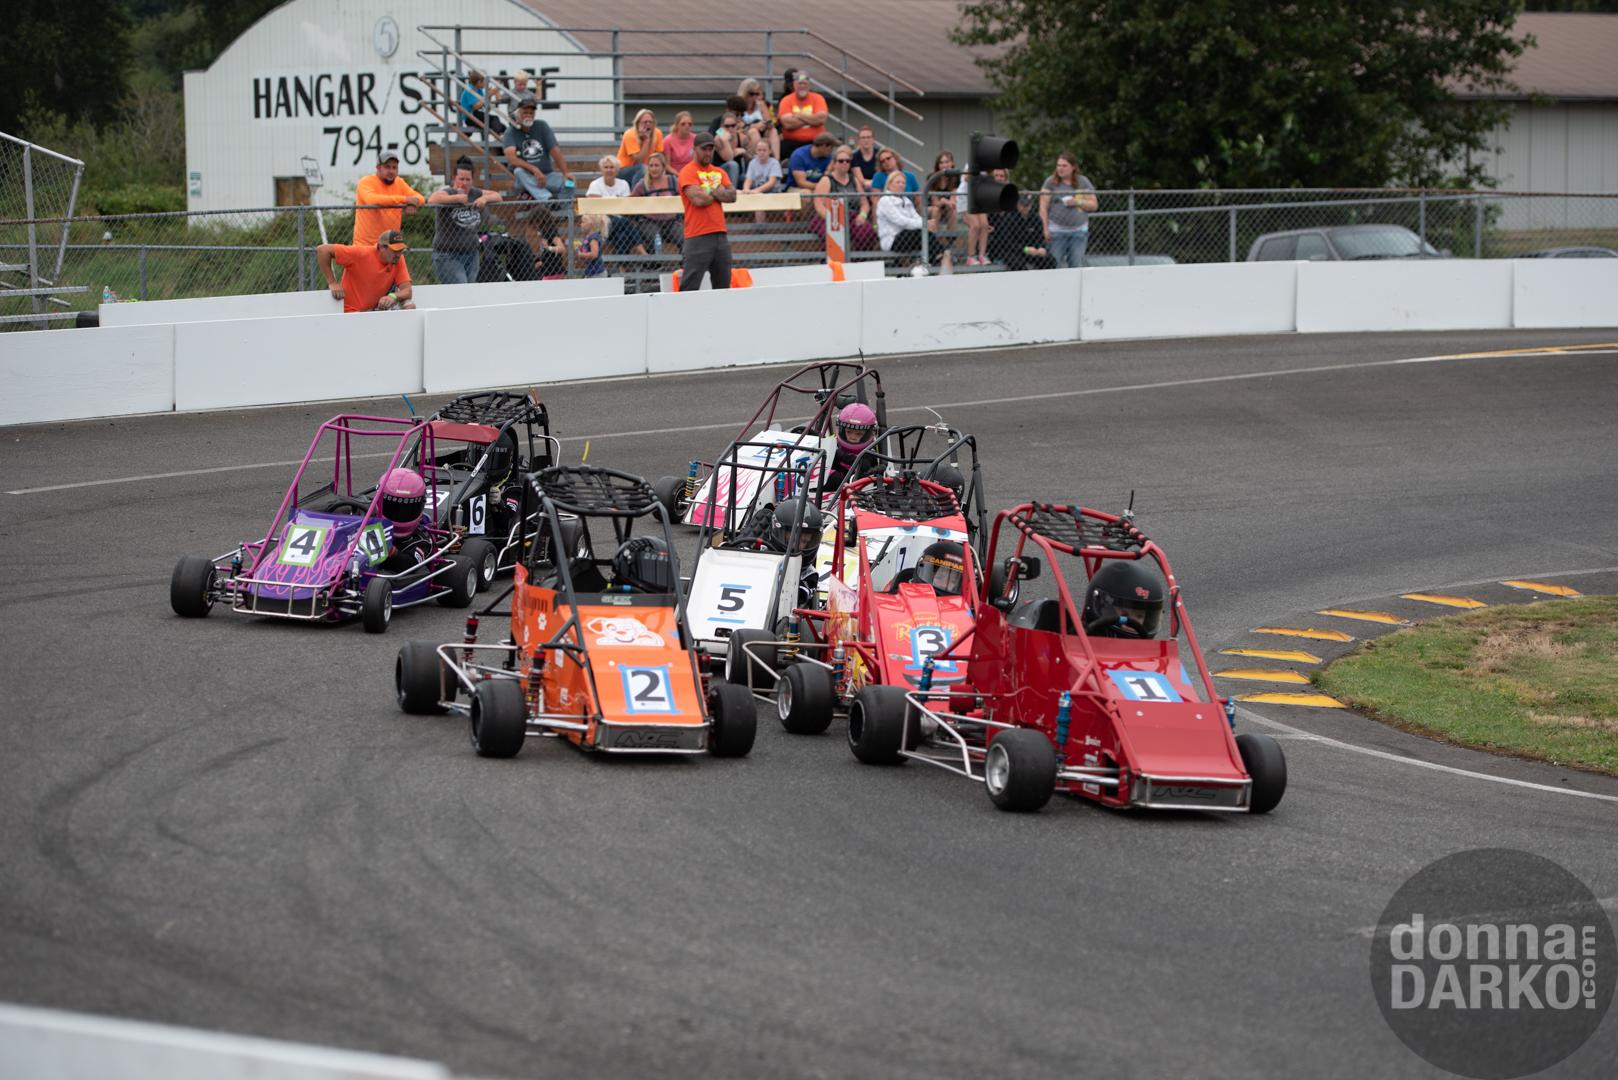 QWMA (Racing) 8-11-2019 DSC_7981.jpg